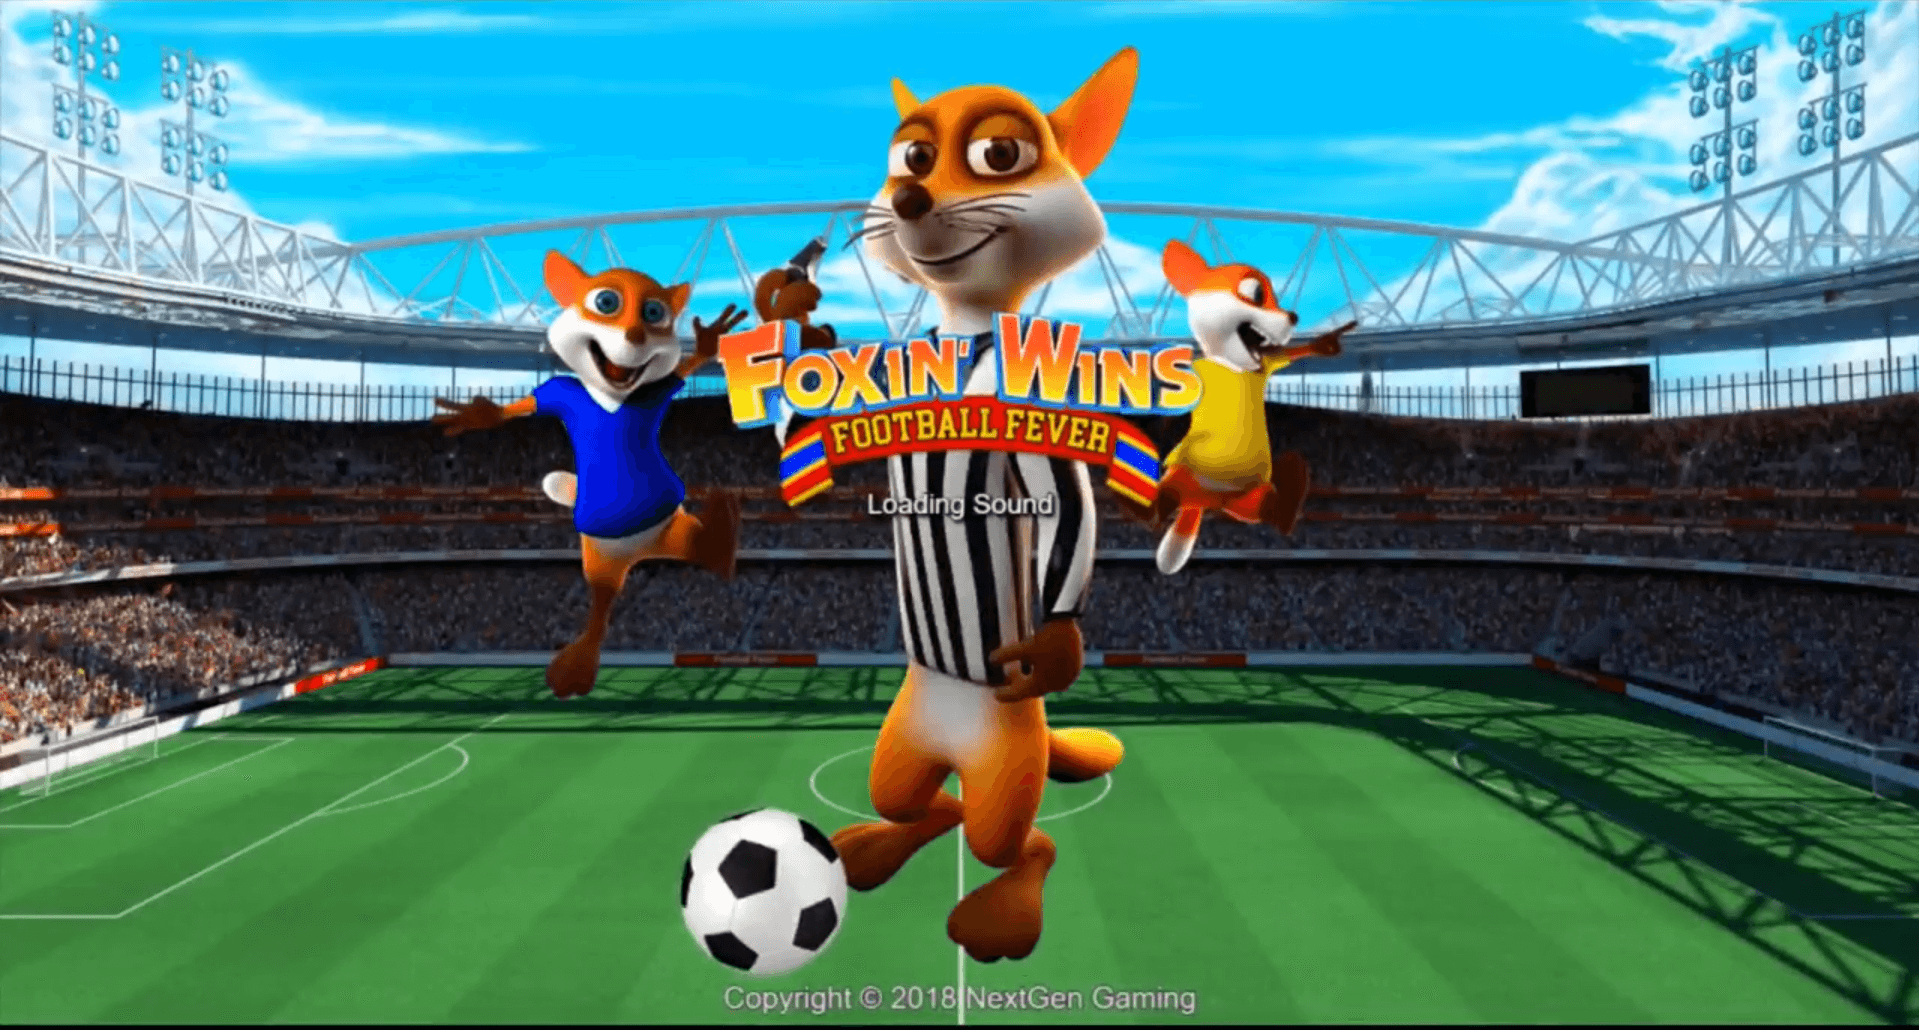 Foxin' Wins Football Fever slot